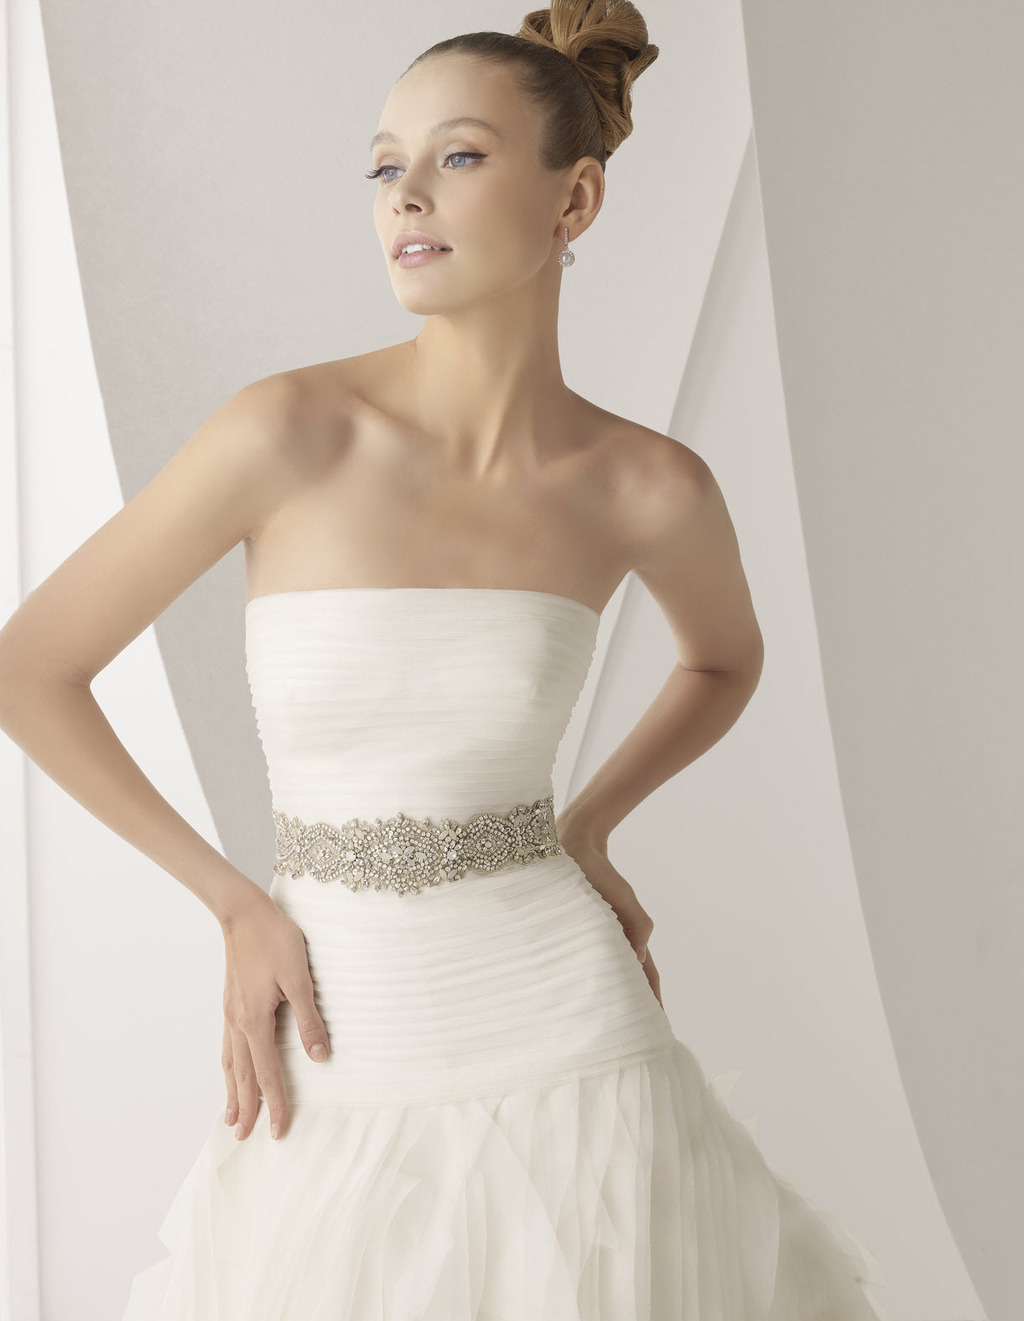 Alcauntara-spring-2012-wedding-dress-rosa-clara-bridal-gowns-strapless-ballgown-bridal-belt-detail.full